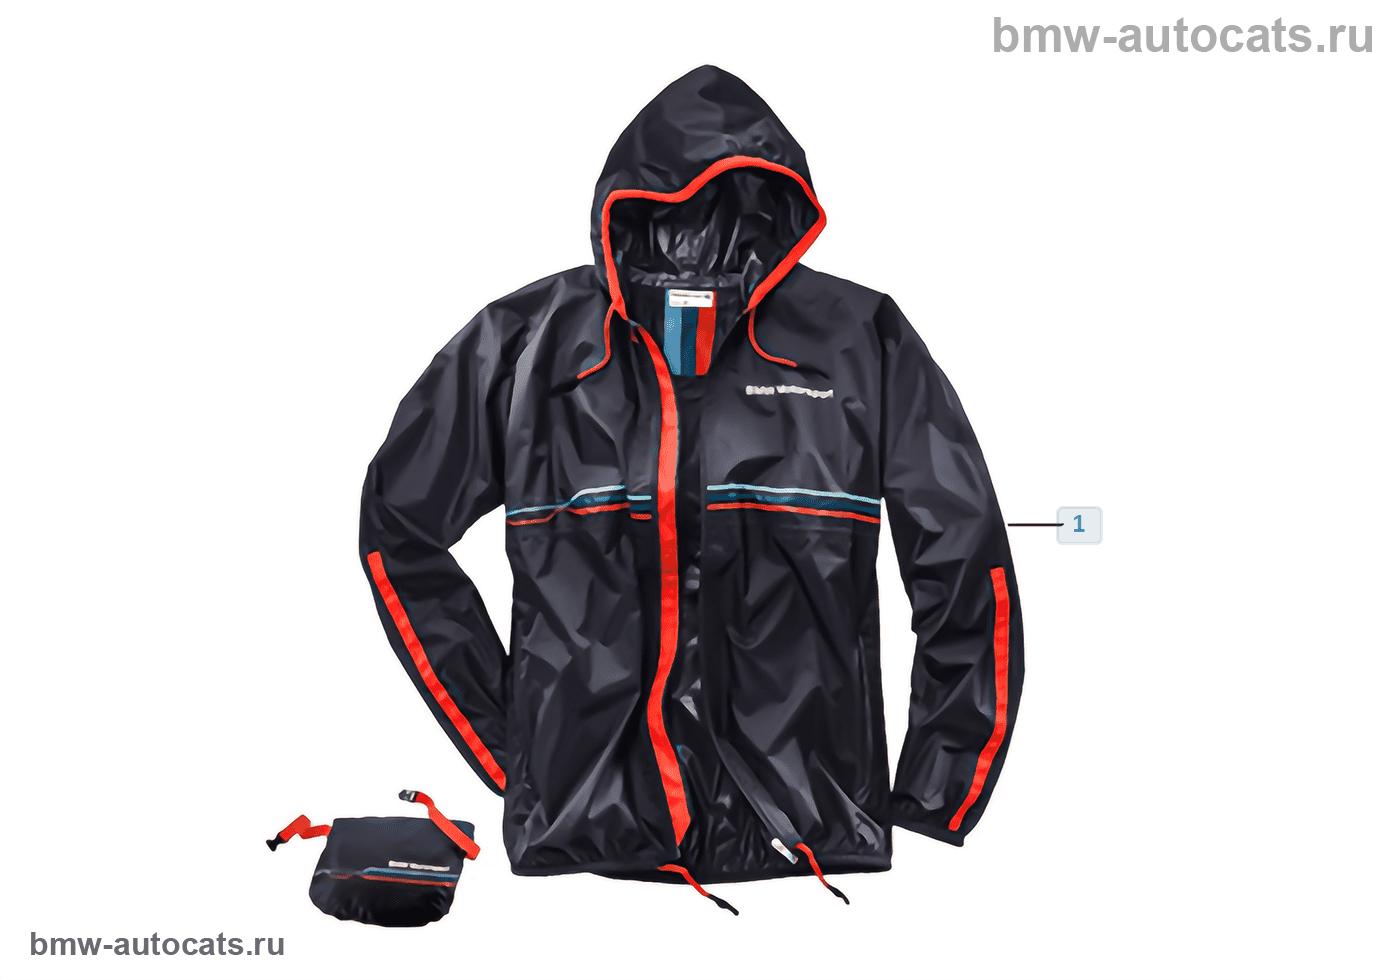 BMW Motorsport — Одежда унисекс 2015/17